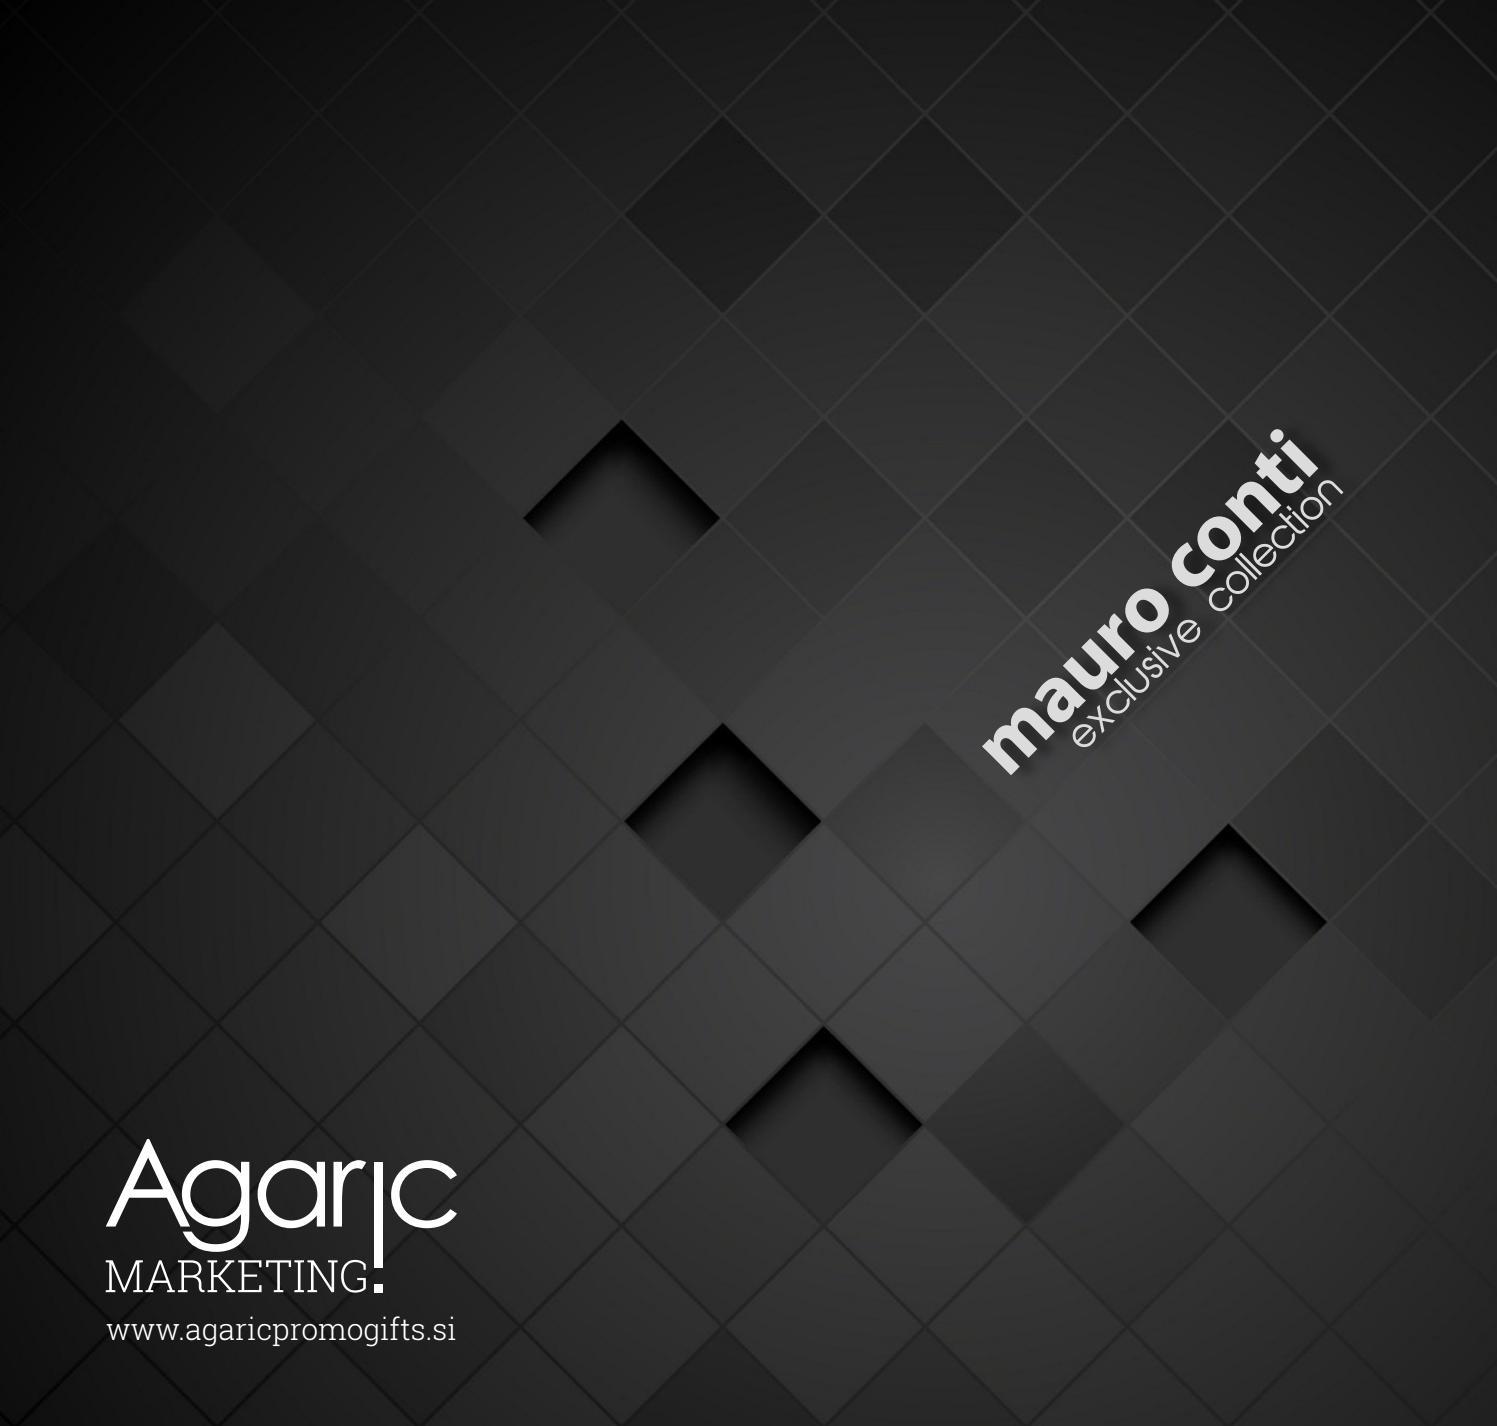 Mauro Conti Catalogue 2016 By Agaric D O O Issuu